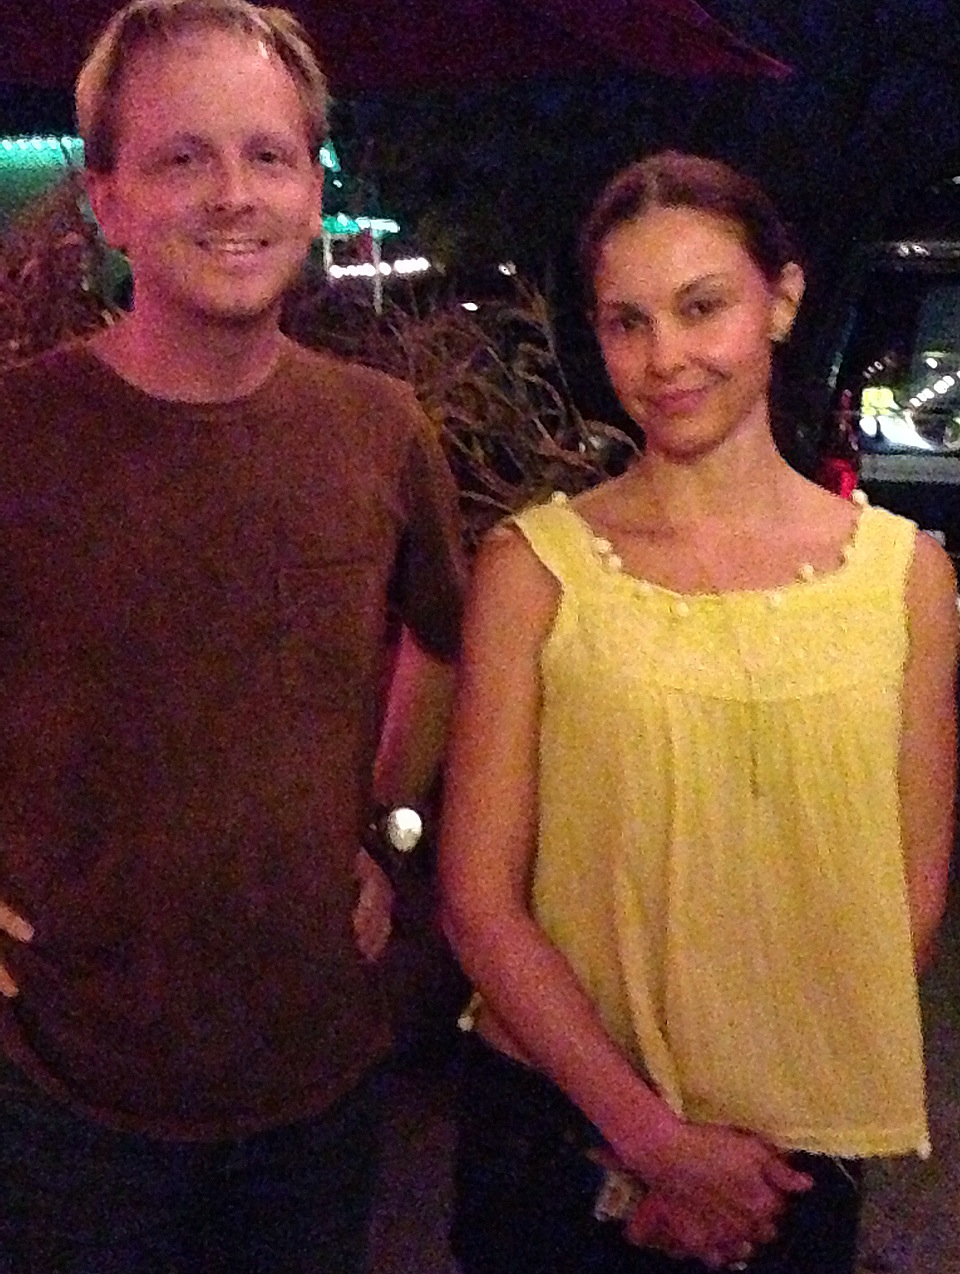 Ed and Ashley Judd